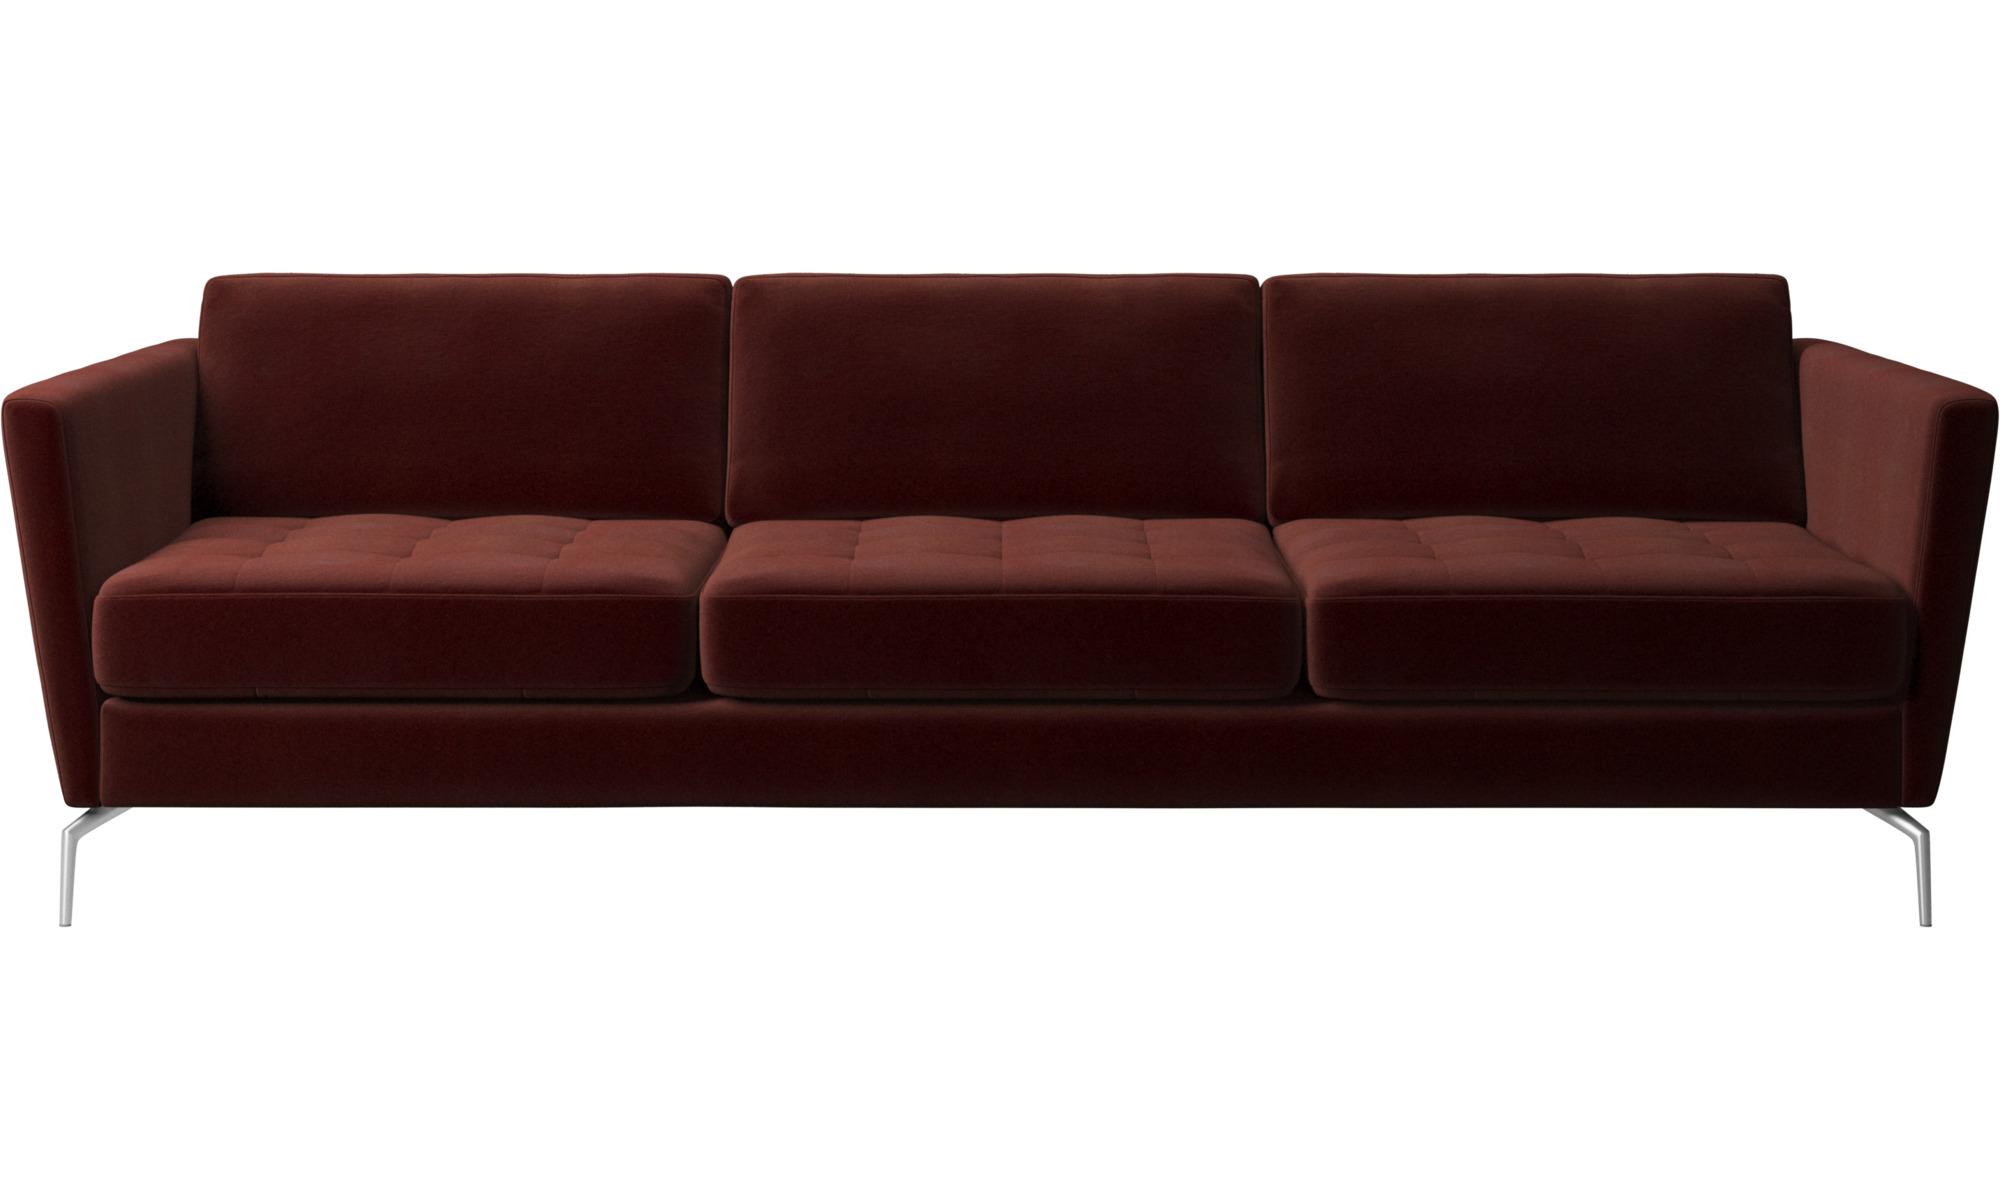 3 seater sofas - Osaka sofa, tufted seat - Red - Fabric